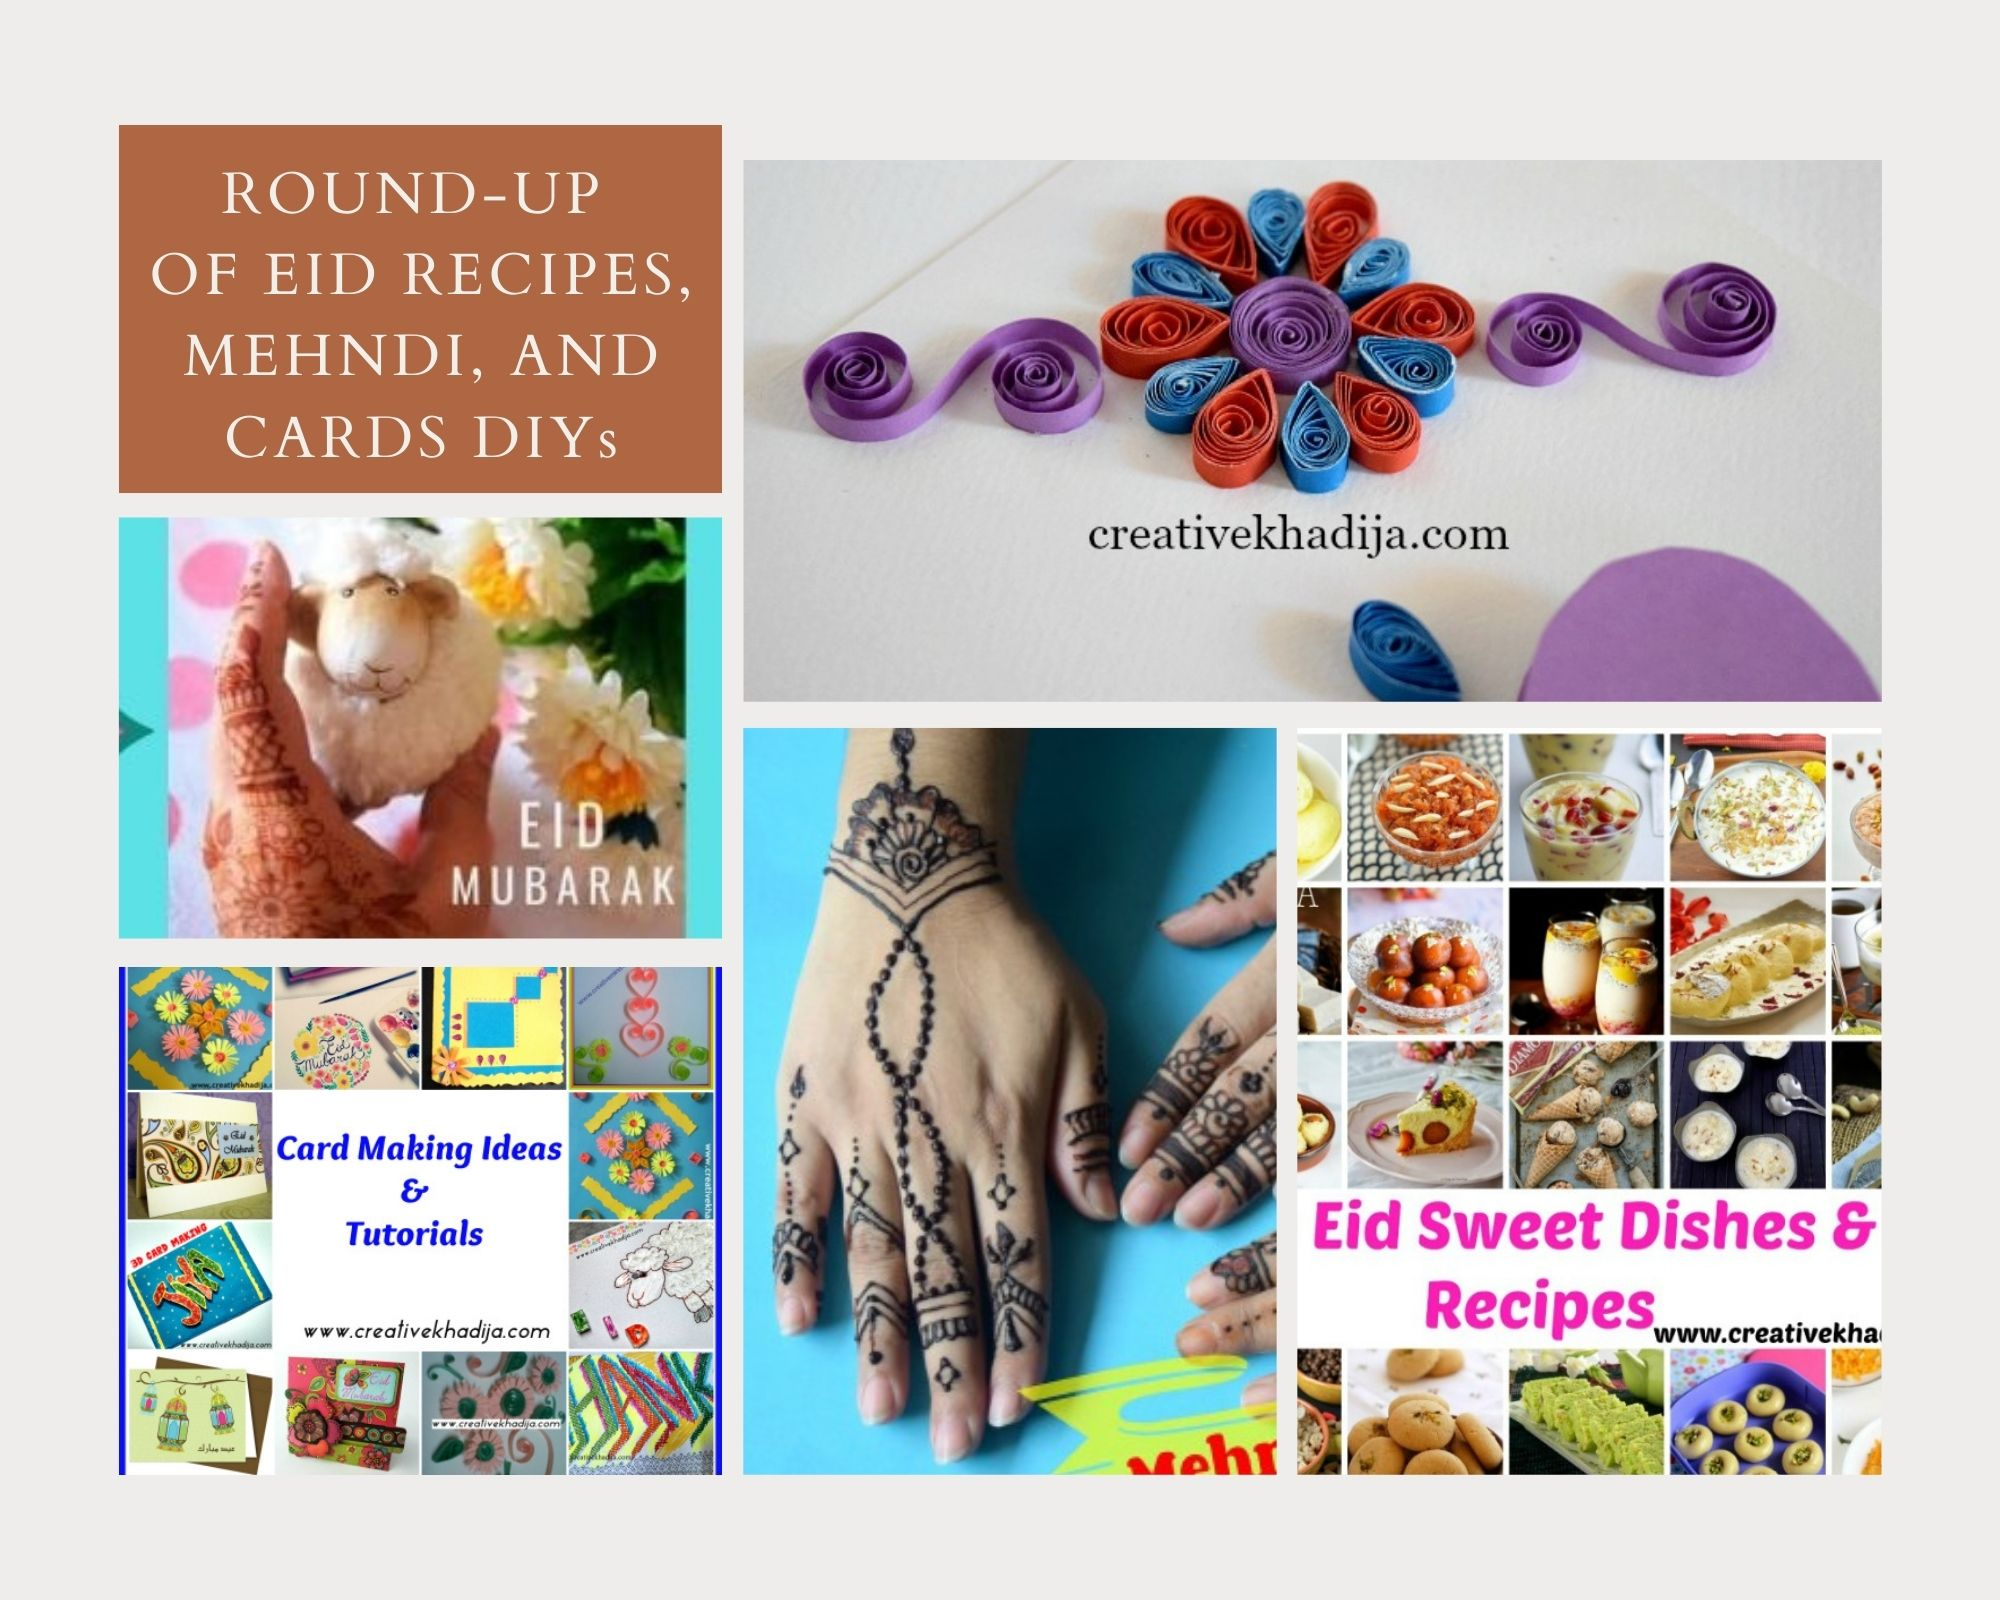 Eid Al Fitr 2021 Top Recipes, Henna Designs & Eid Cards Collection